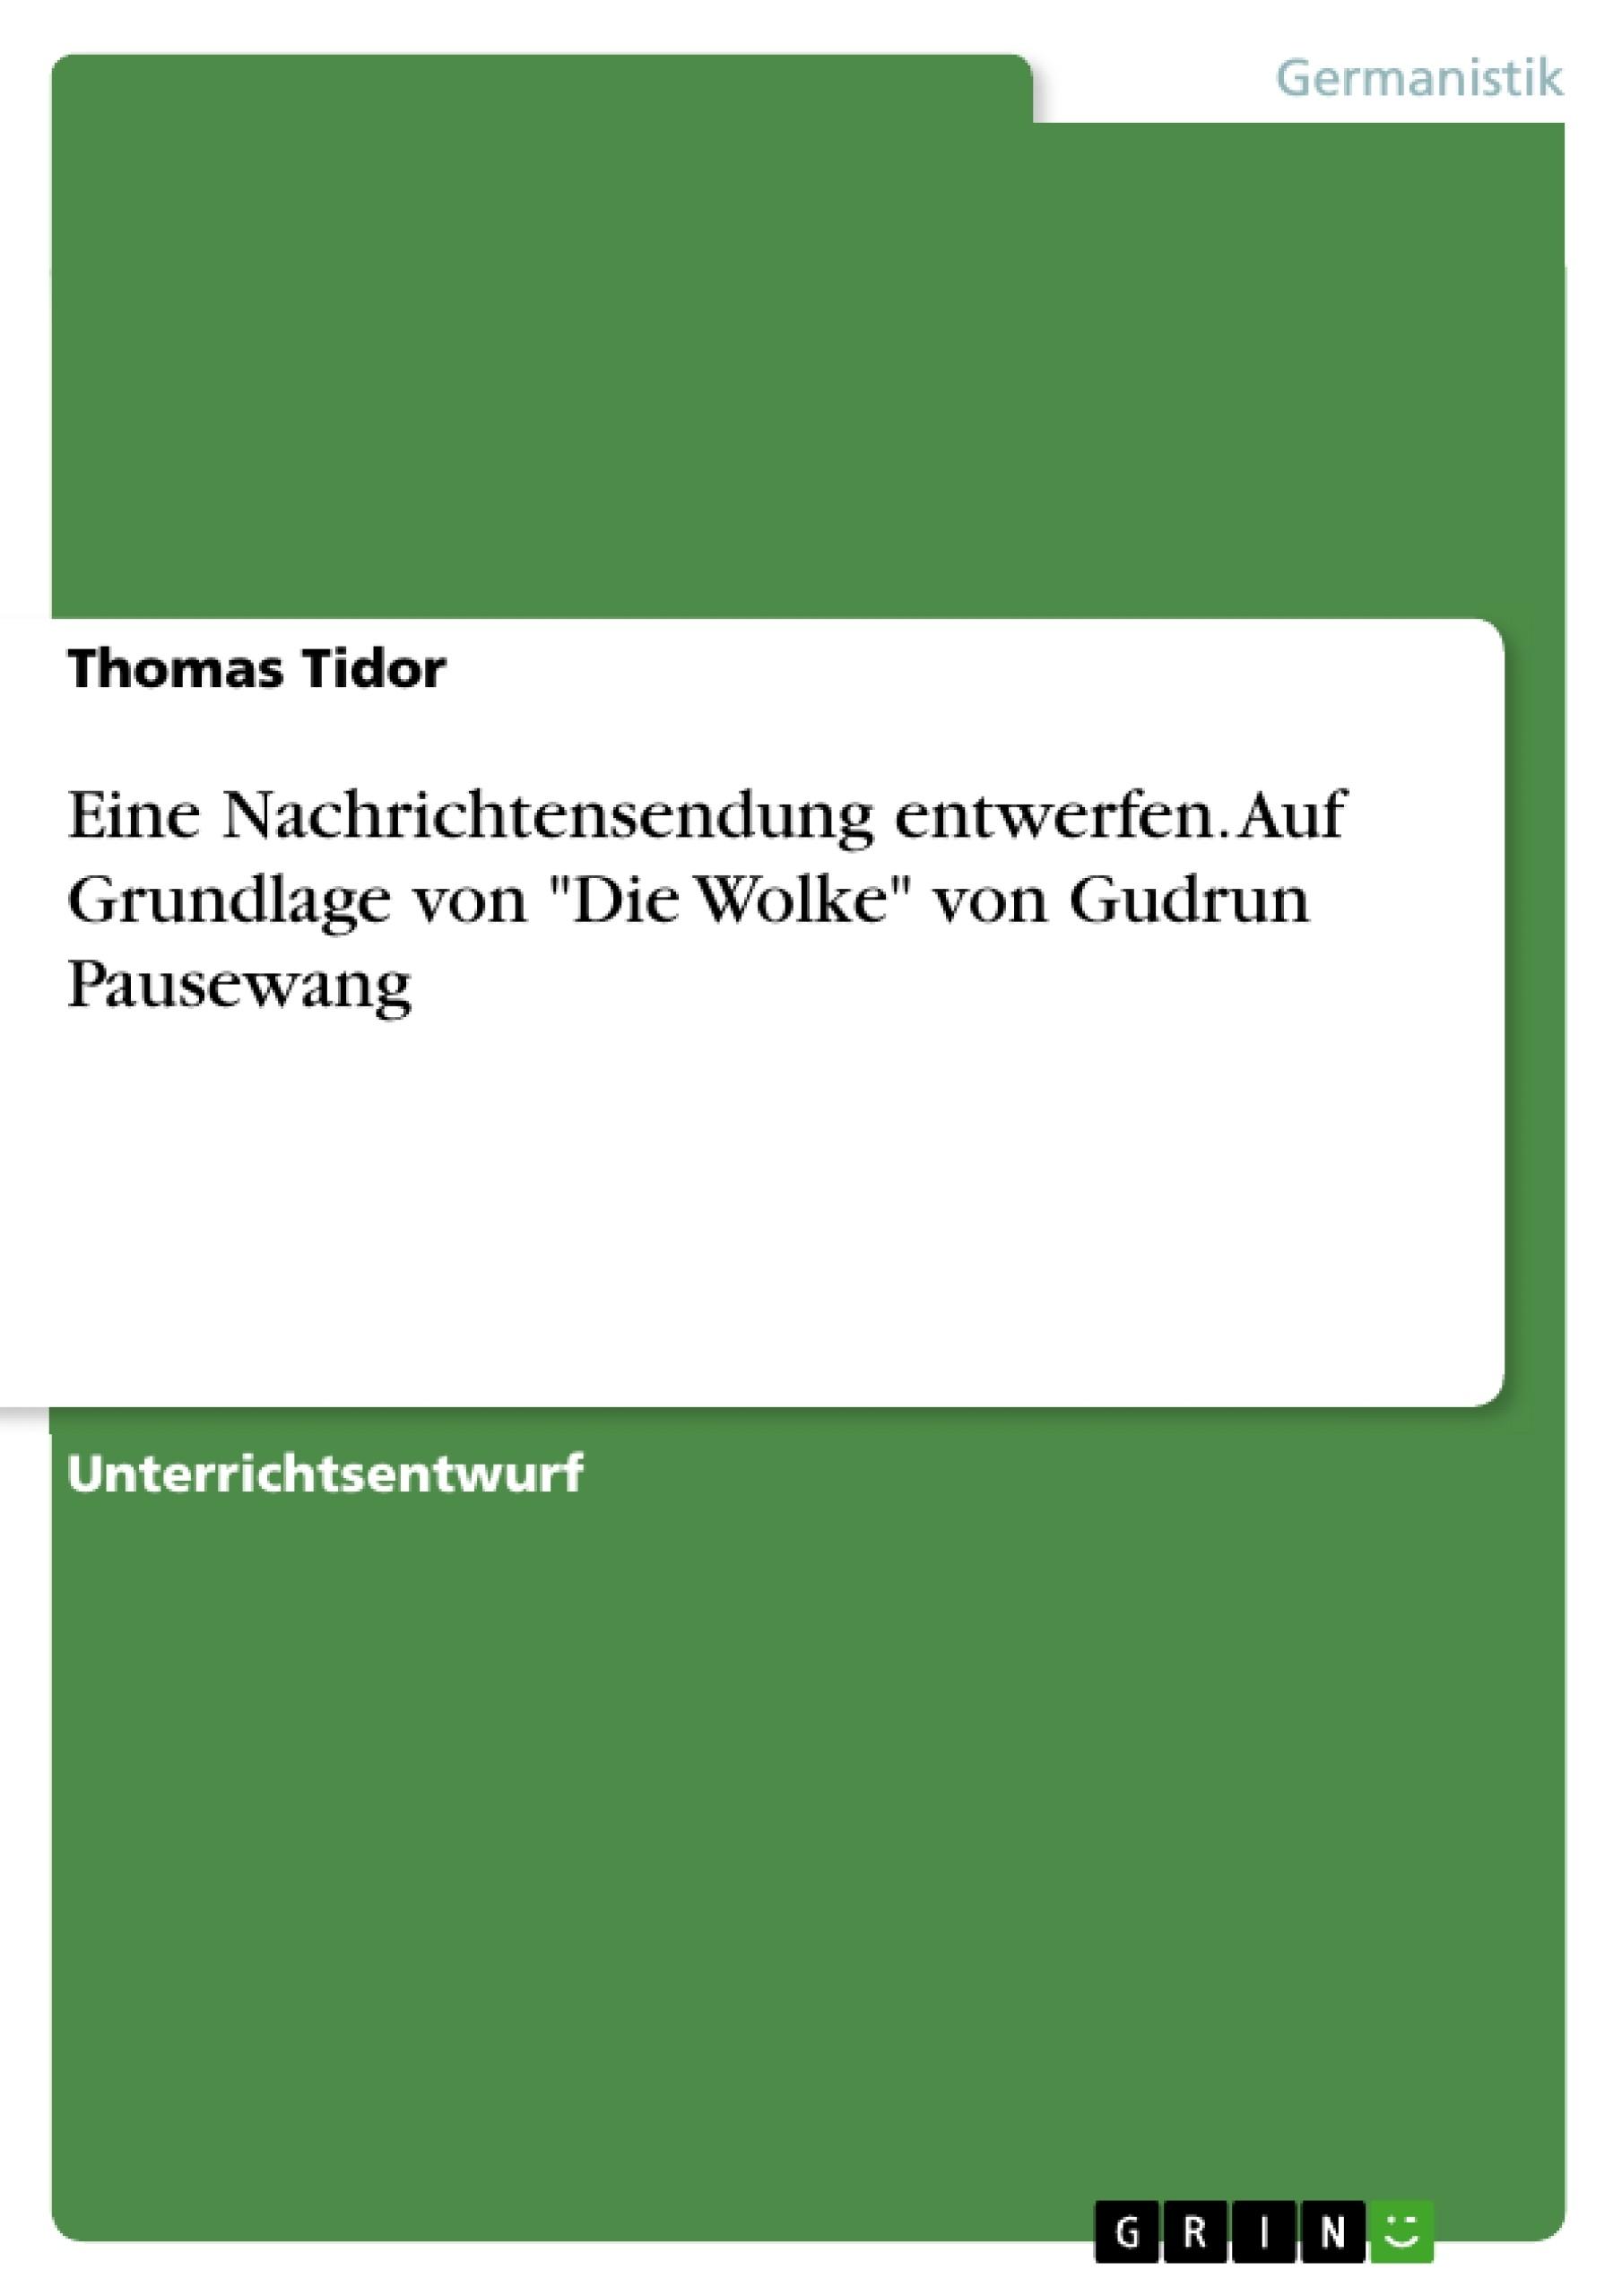 buy Heidegger and Homecoming